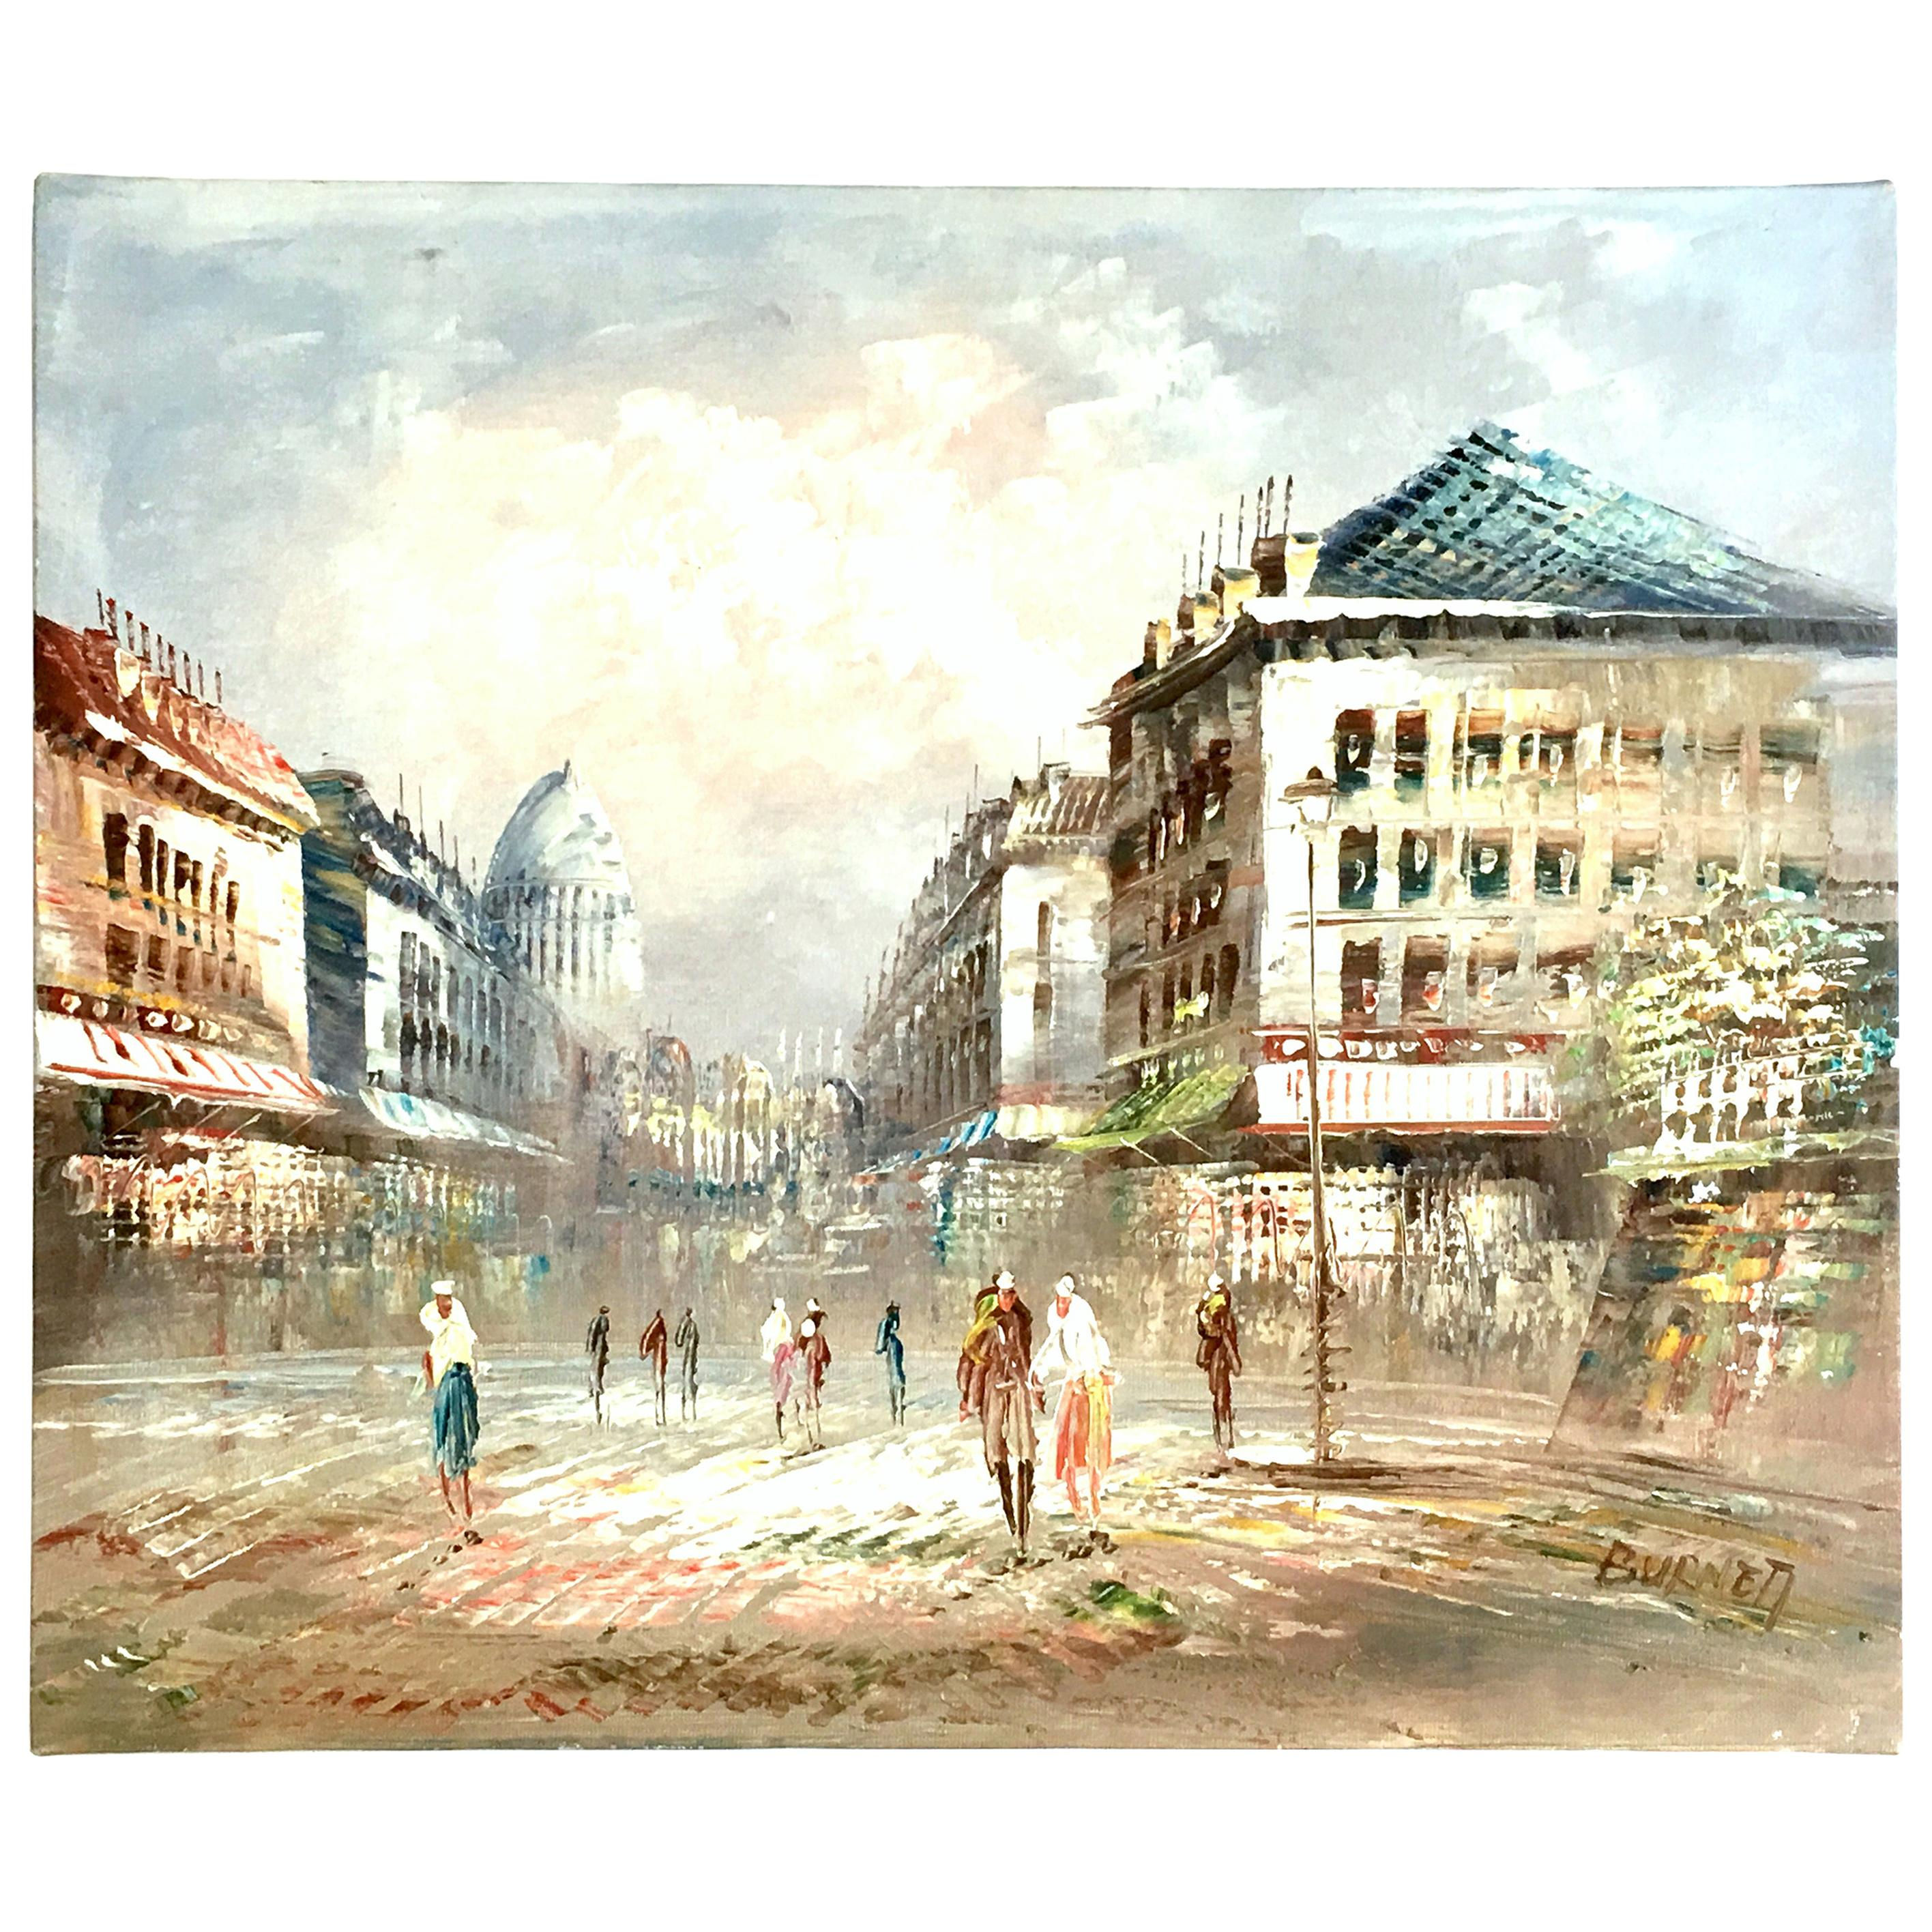 20th Century Original Oil on Canvas Paris Street Scene Painting by C. Burnett